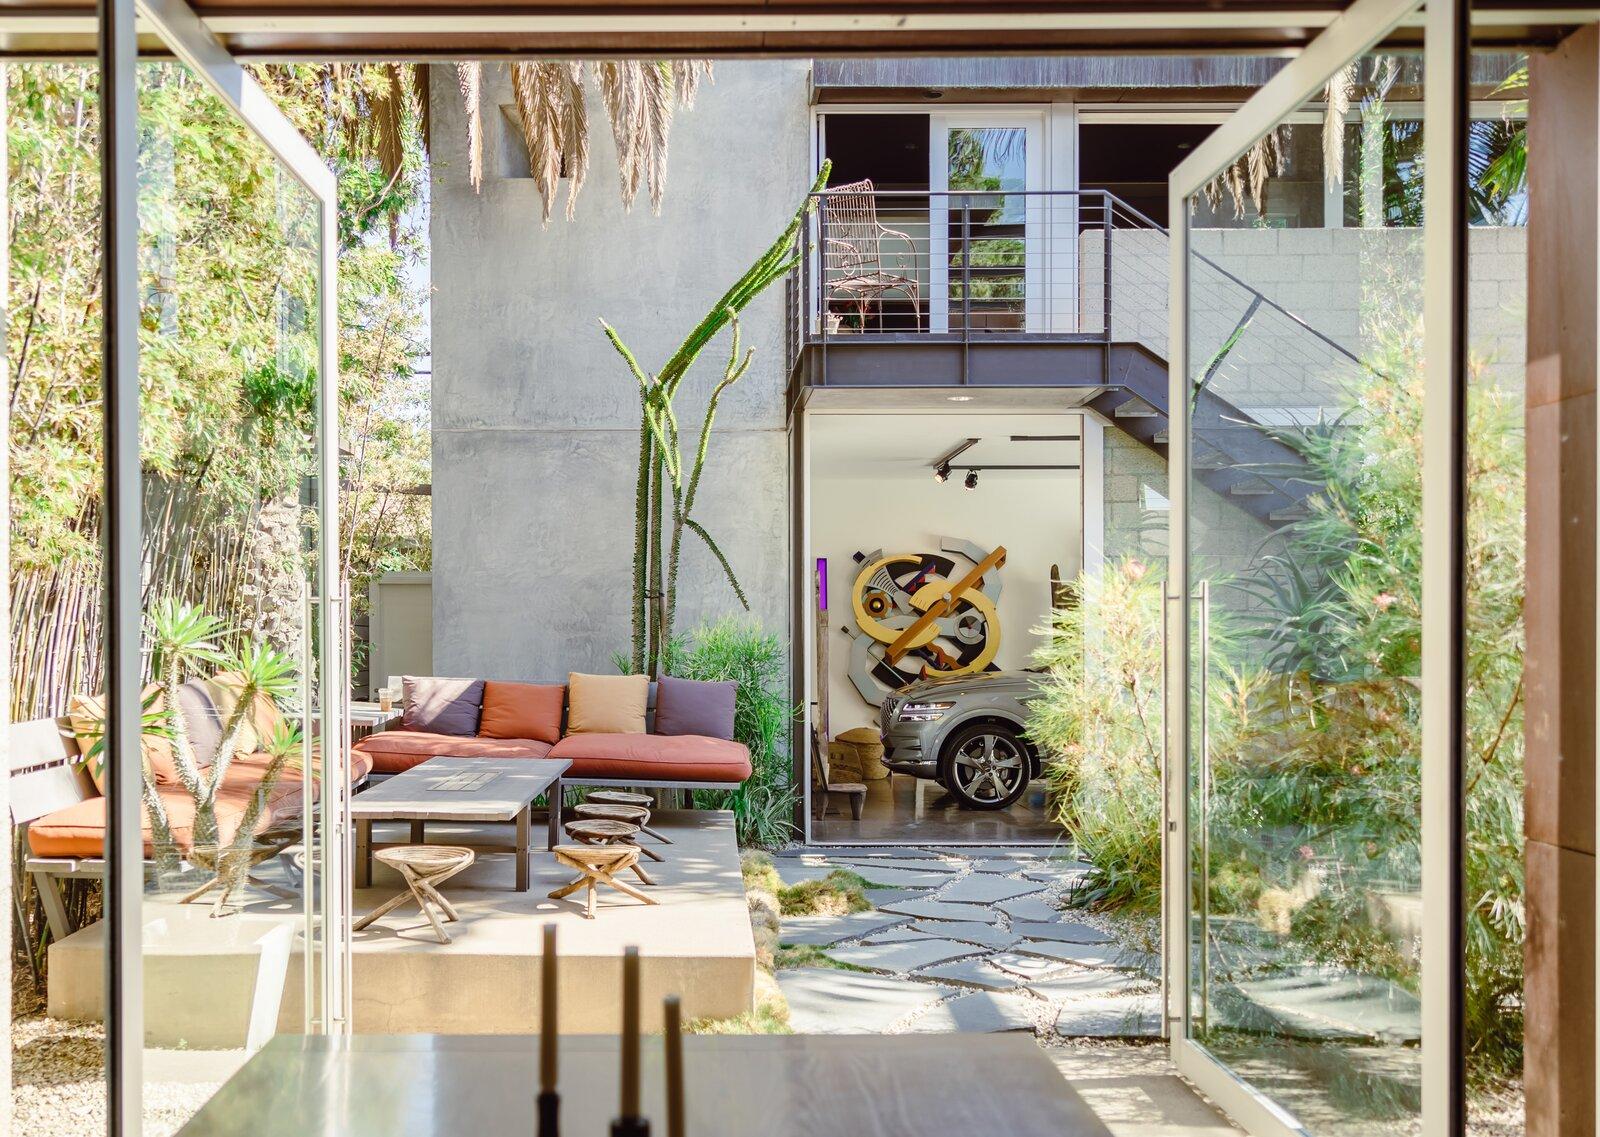 700 Palms courtyard